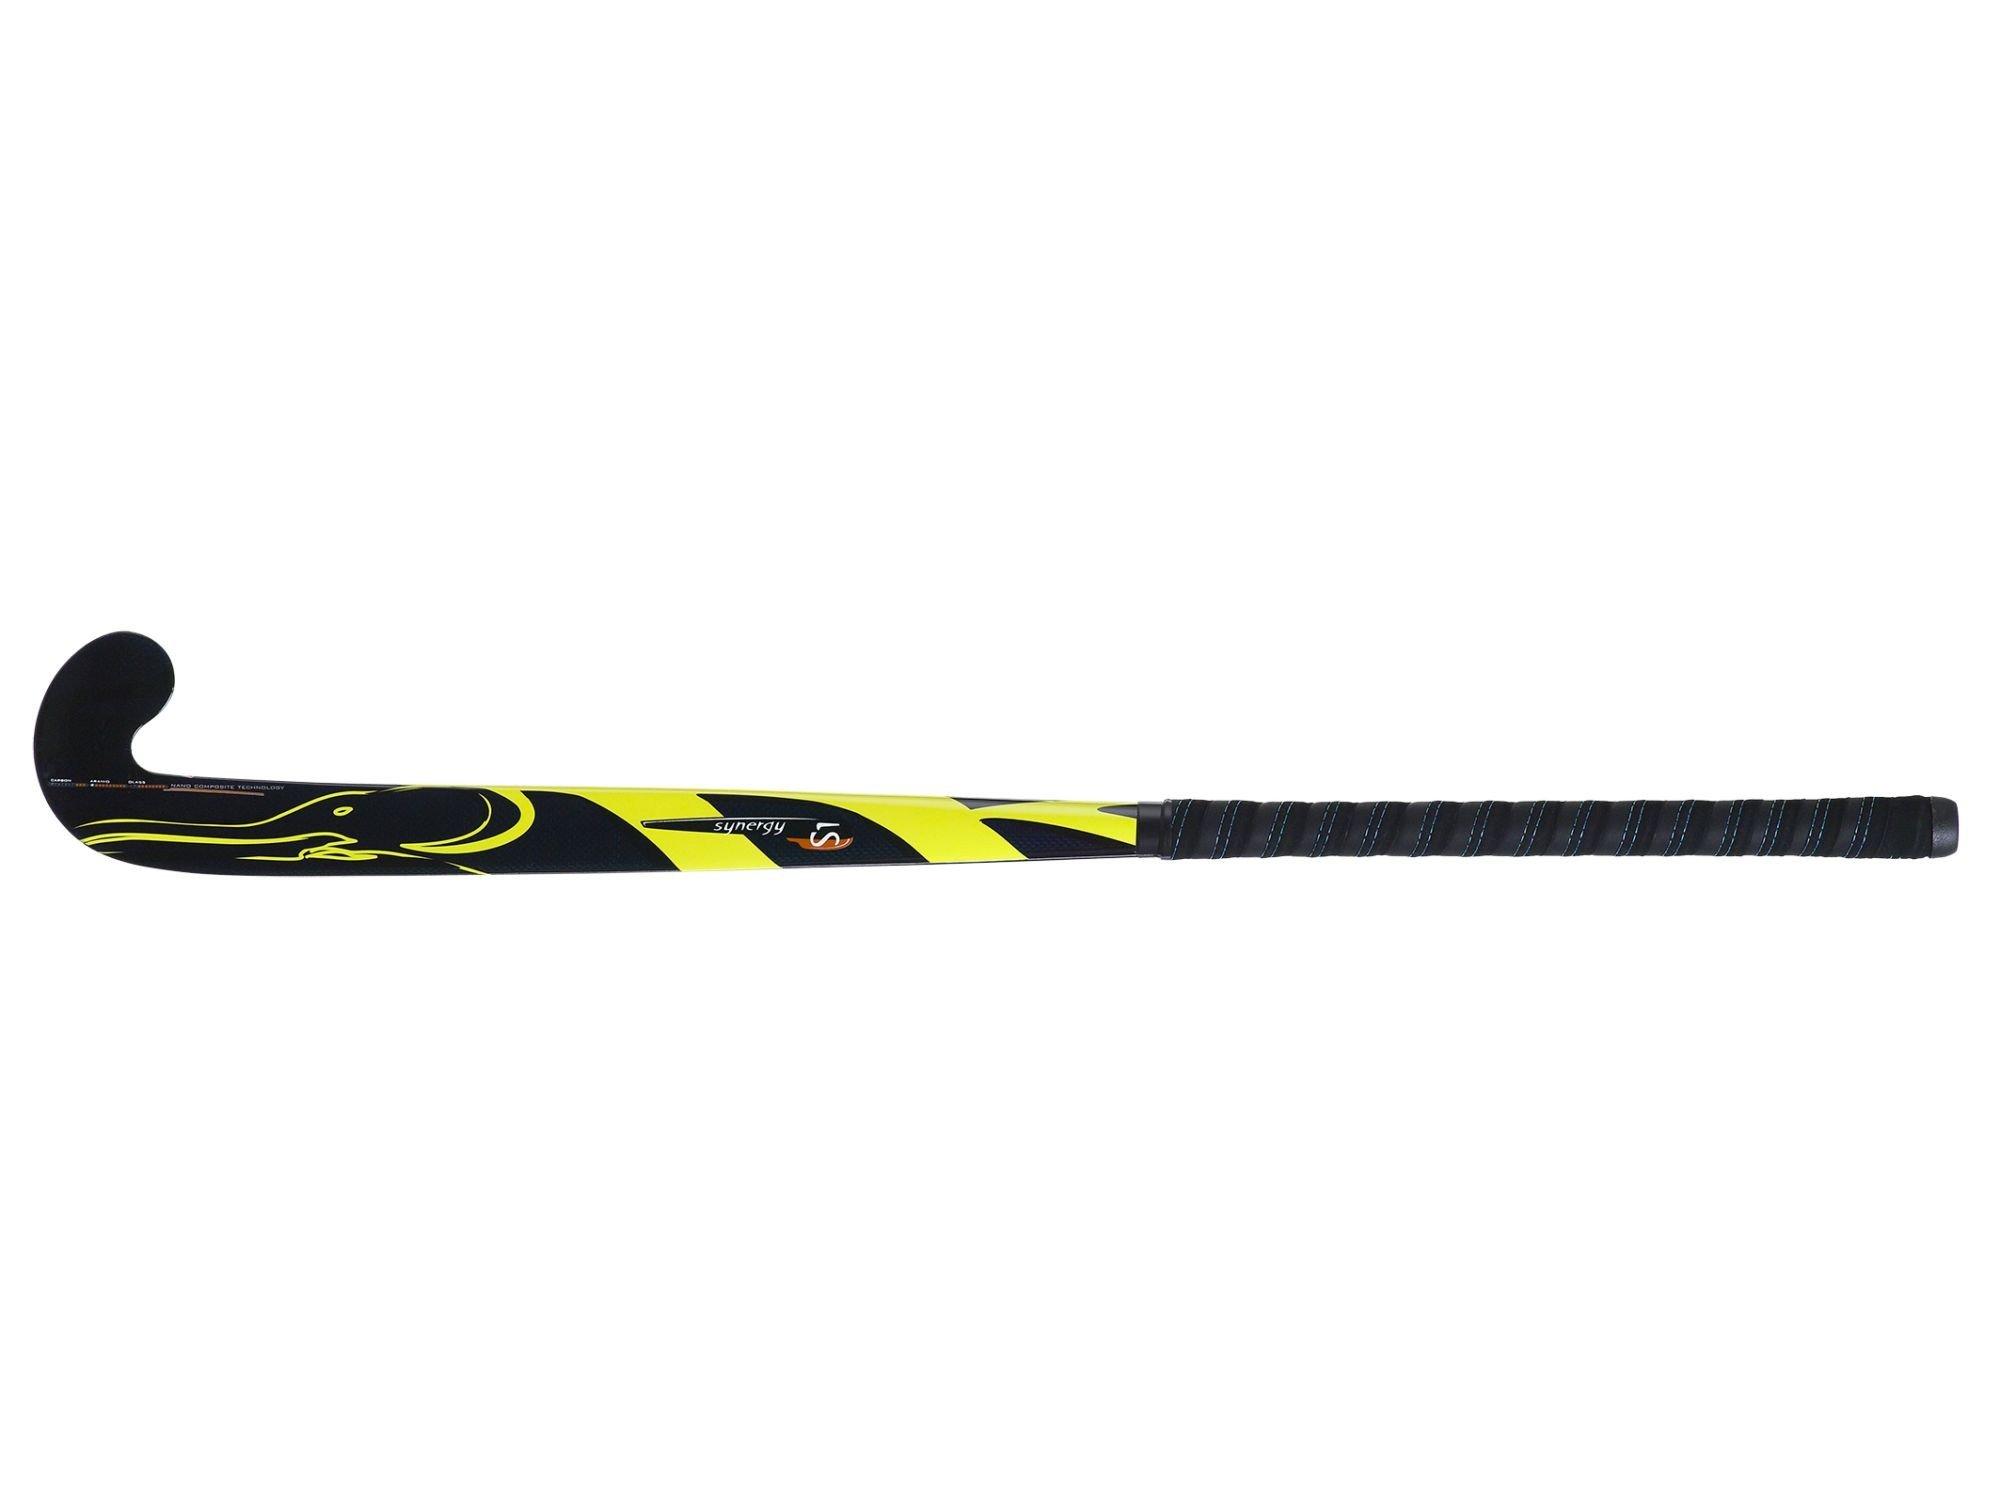 2016/17 TK Synergy Series S1 Ultimate Hockey Stick